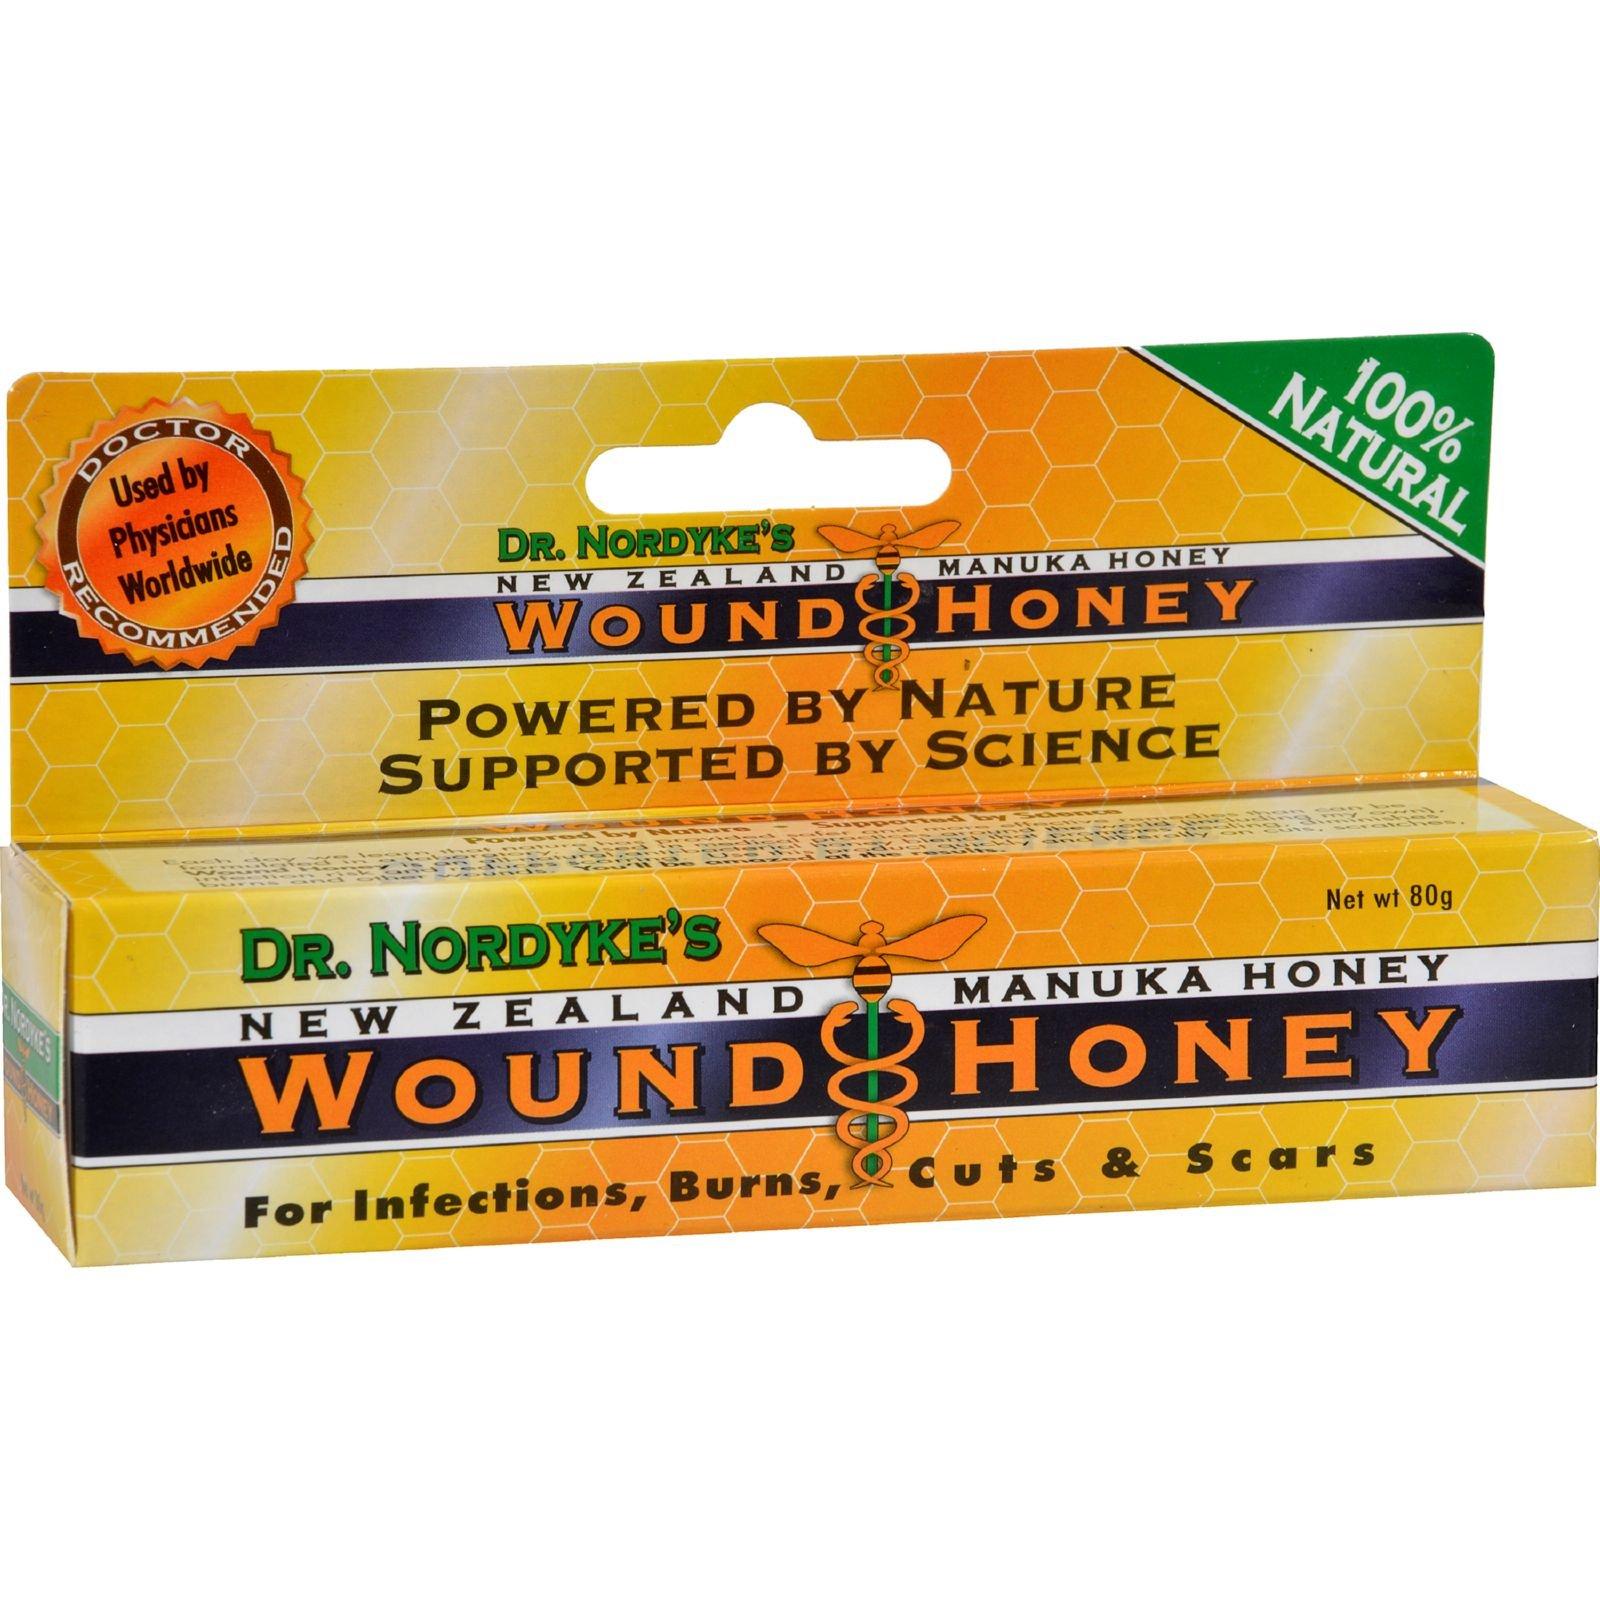 Wound Honey, Manuka Honey Wound Cream with Active Manuka Honey (1 Color, 2 Pack) by Eras Natural Sciences